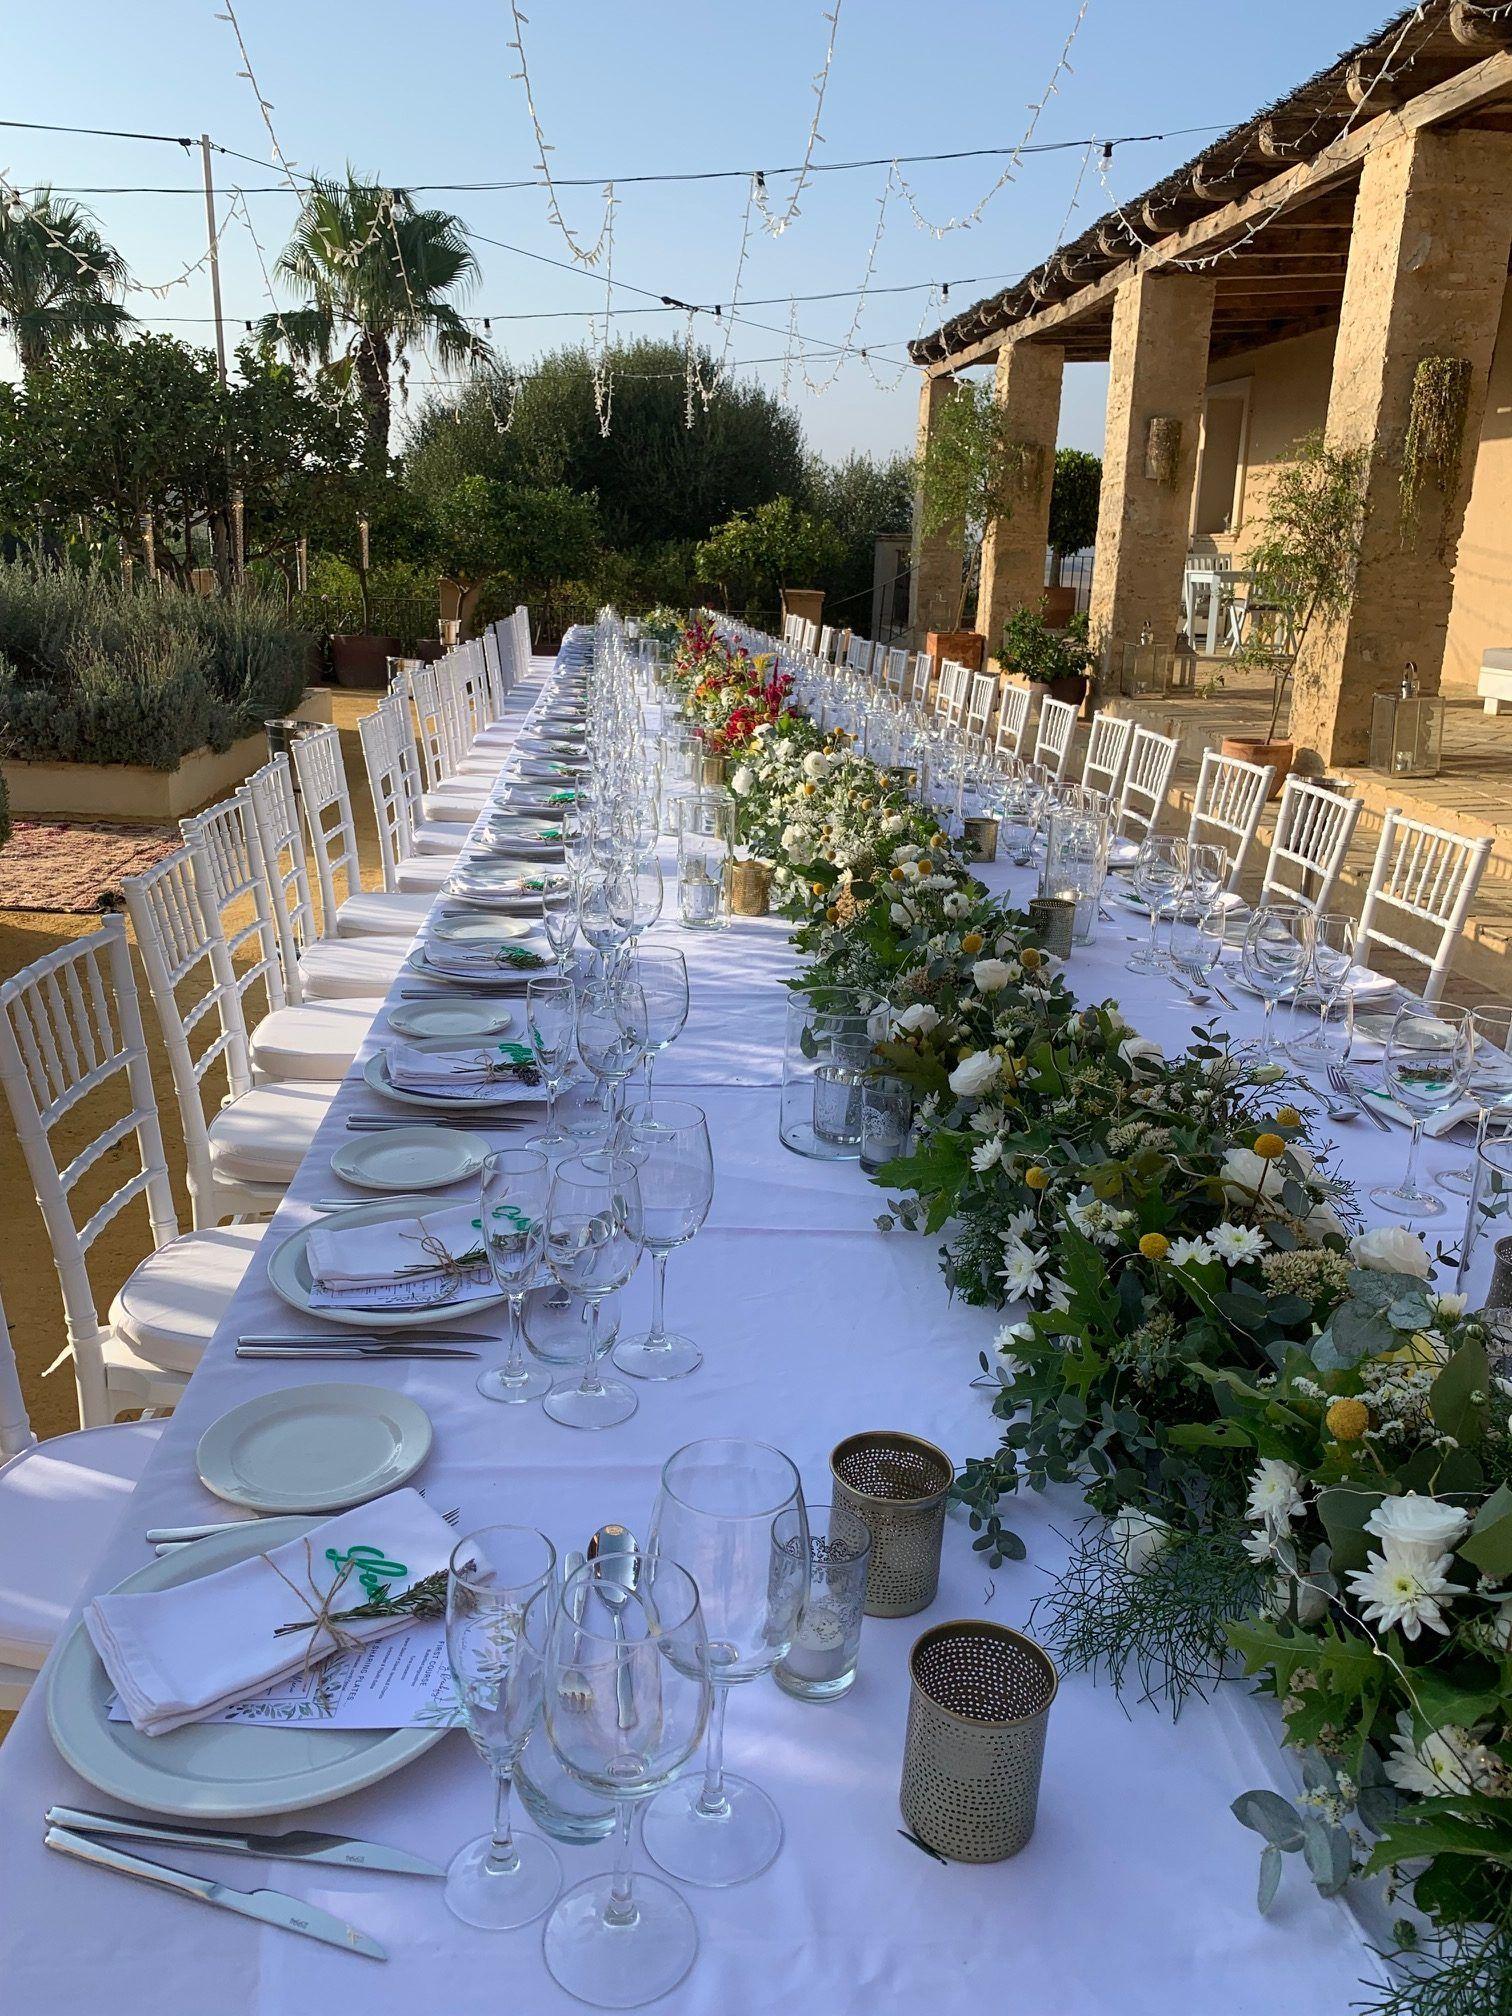 Wedding-Season-around-the-corner-Florium-Sotogrande-Flower-Shop-Cádiz-Spain 12